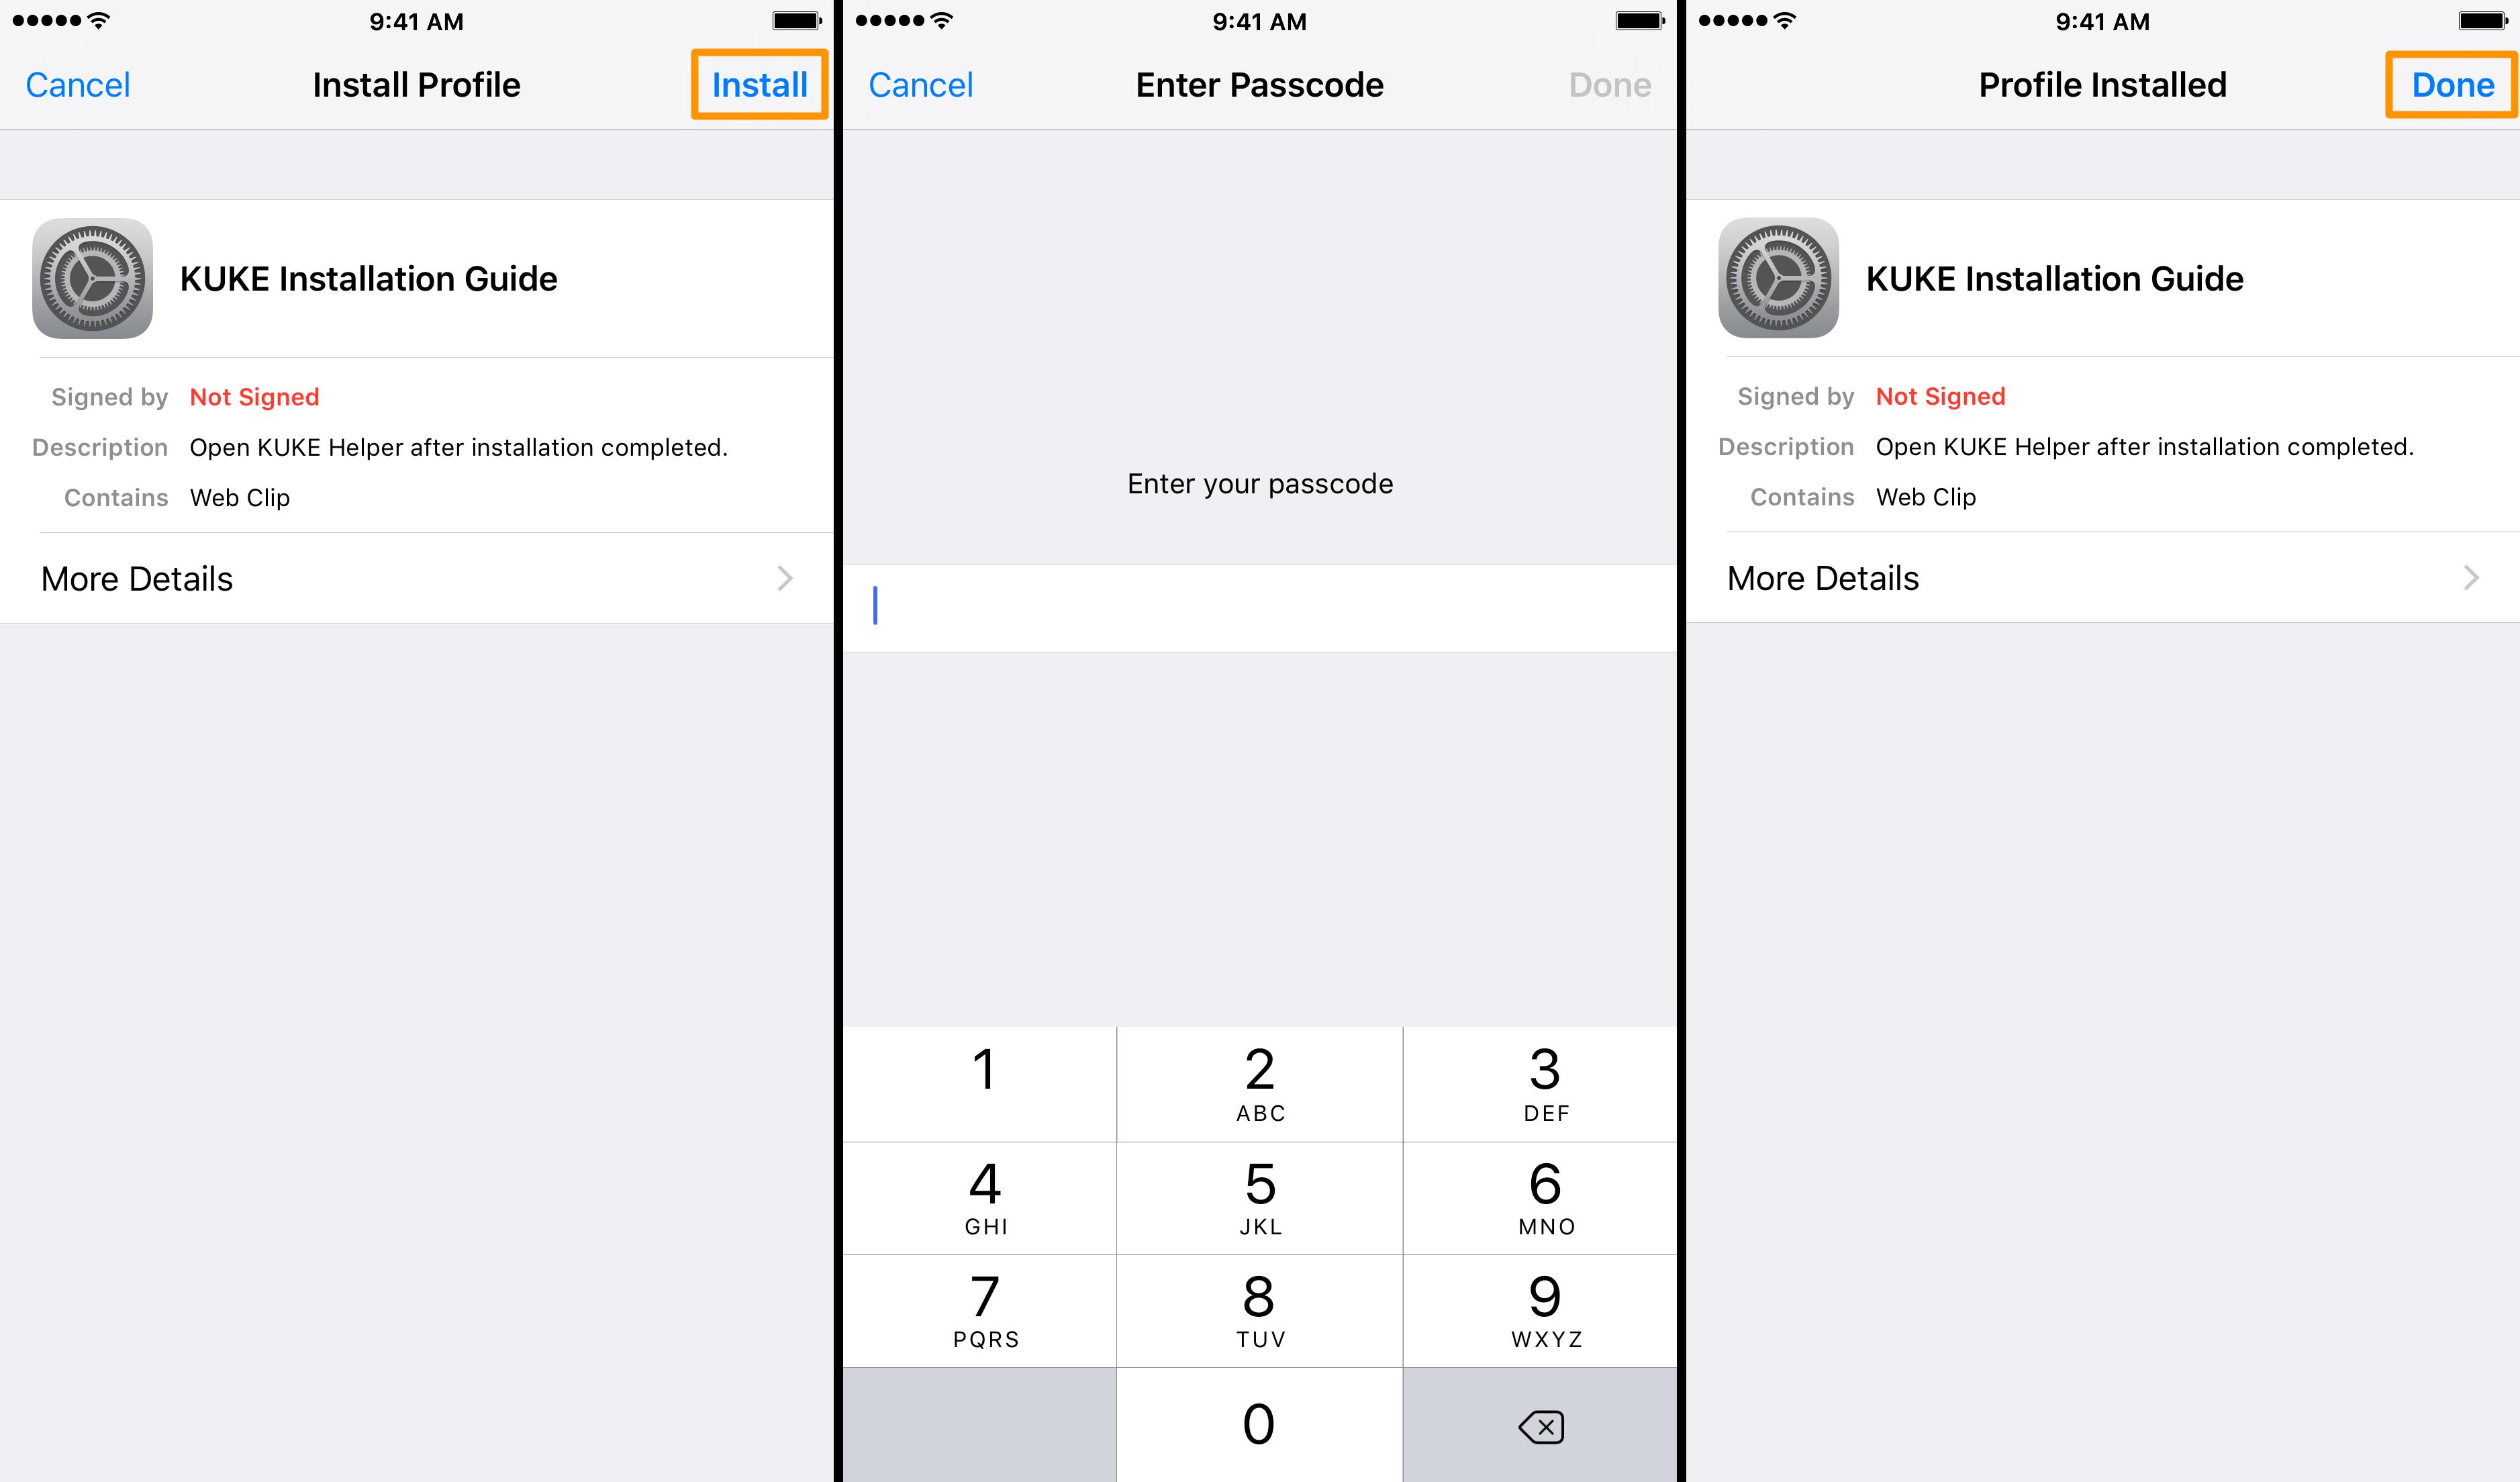 KUKE Install Profile iOS